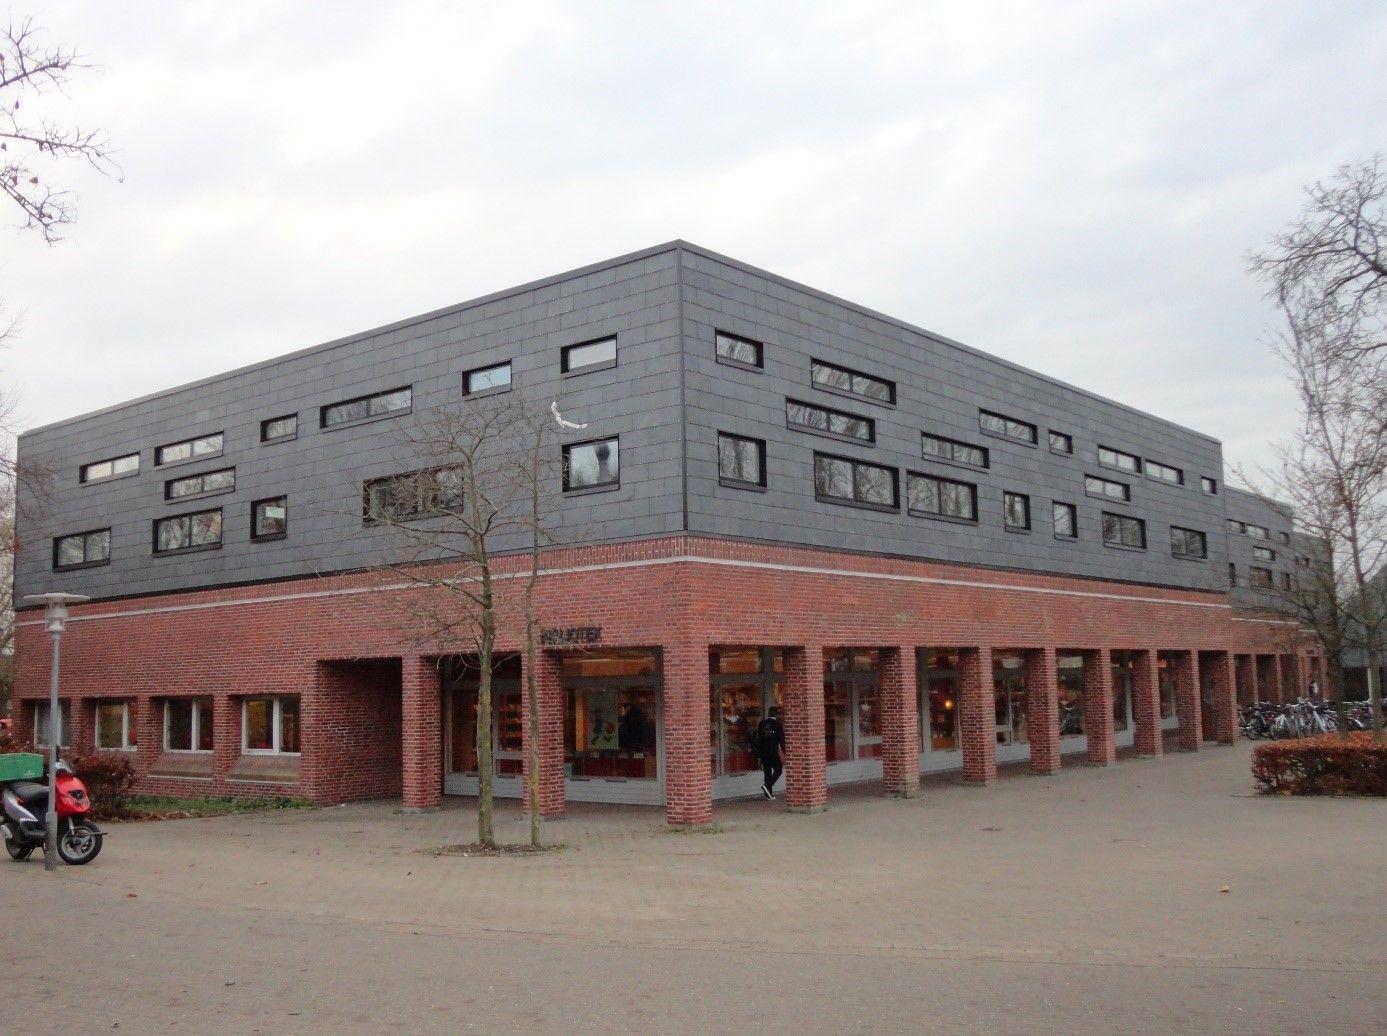 Solrød Bibliotek